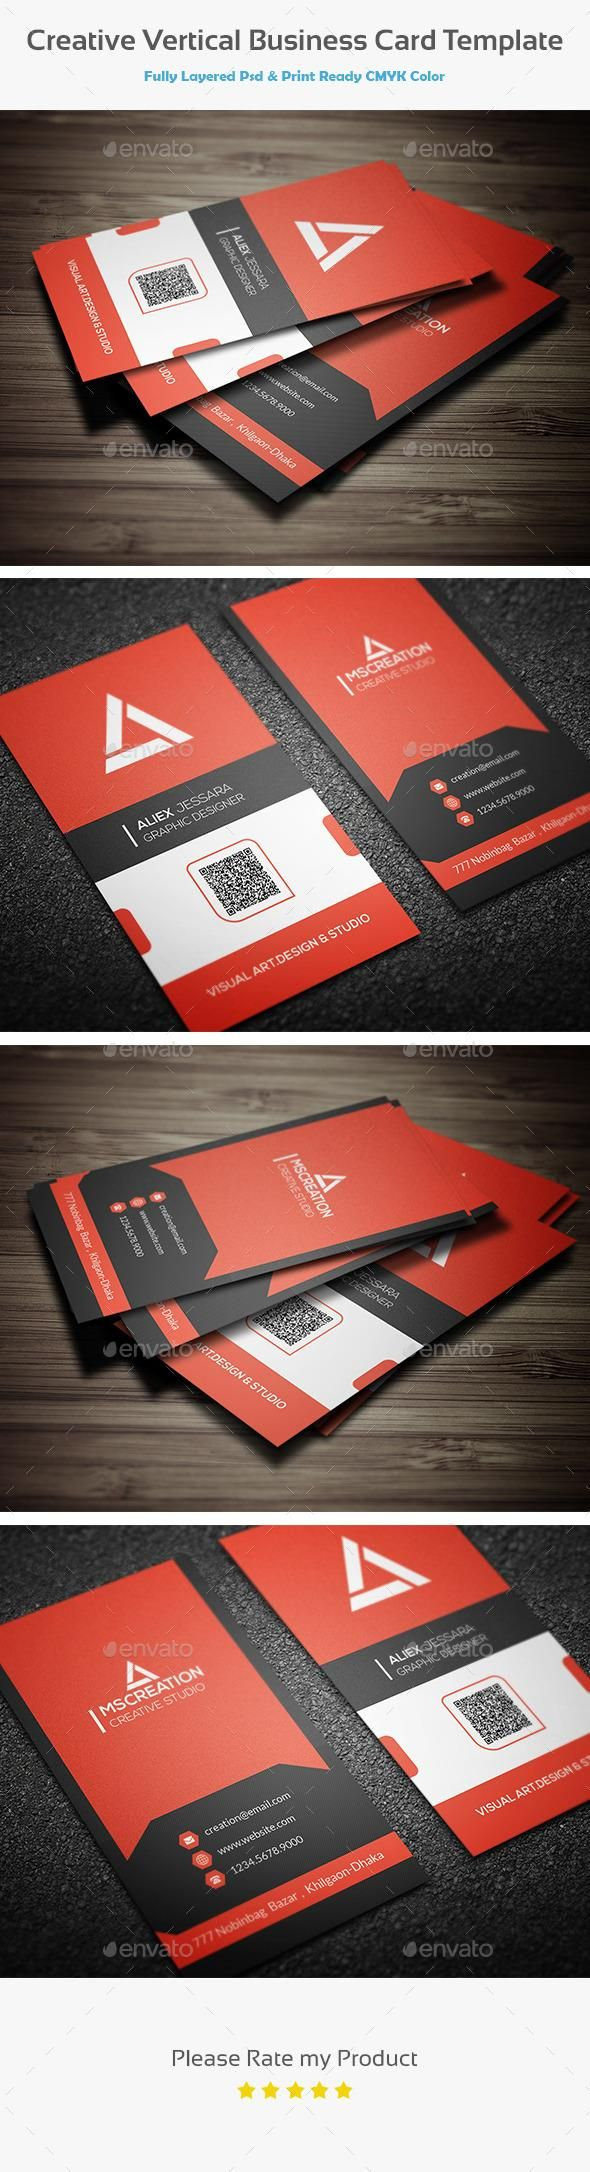 363 Best Business Card Design Images On Pinterest Business Card